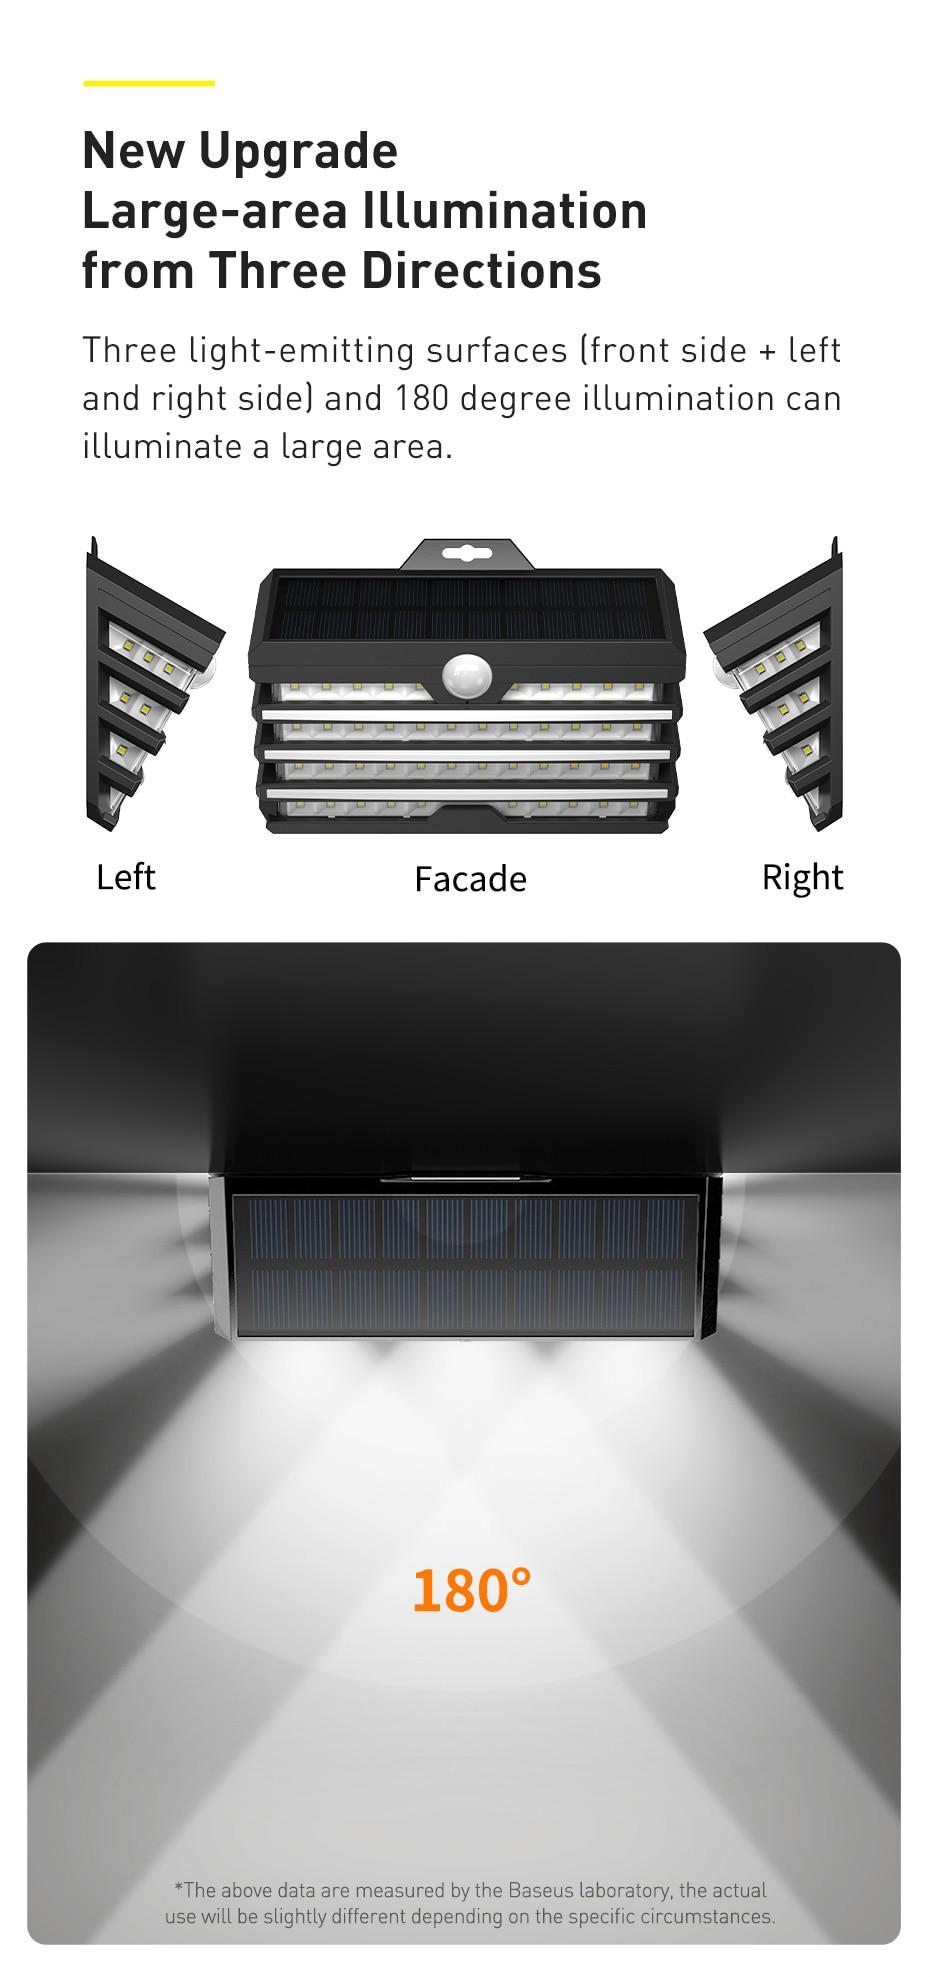 BASEUS ENERGY SOLAR LED LIGHT OUTDOOR WALL LAMP 6